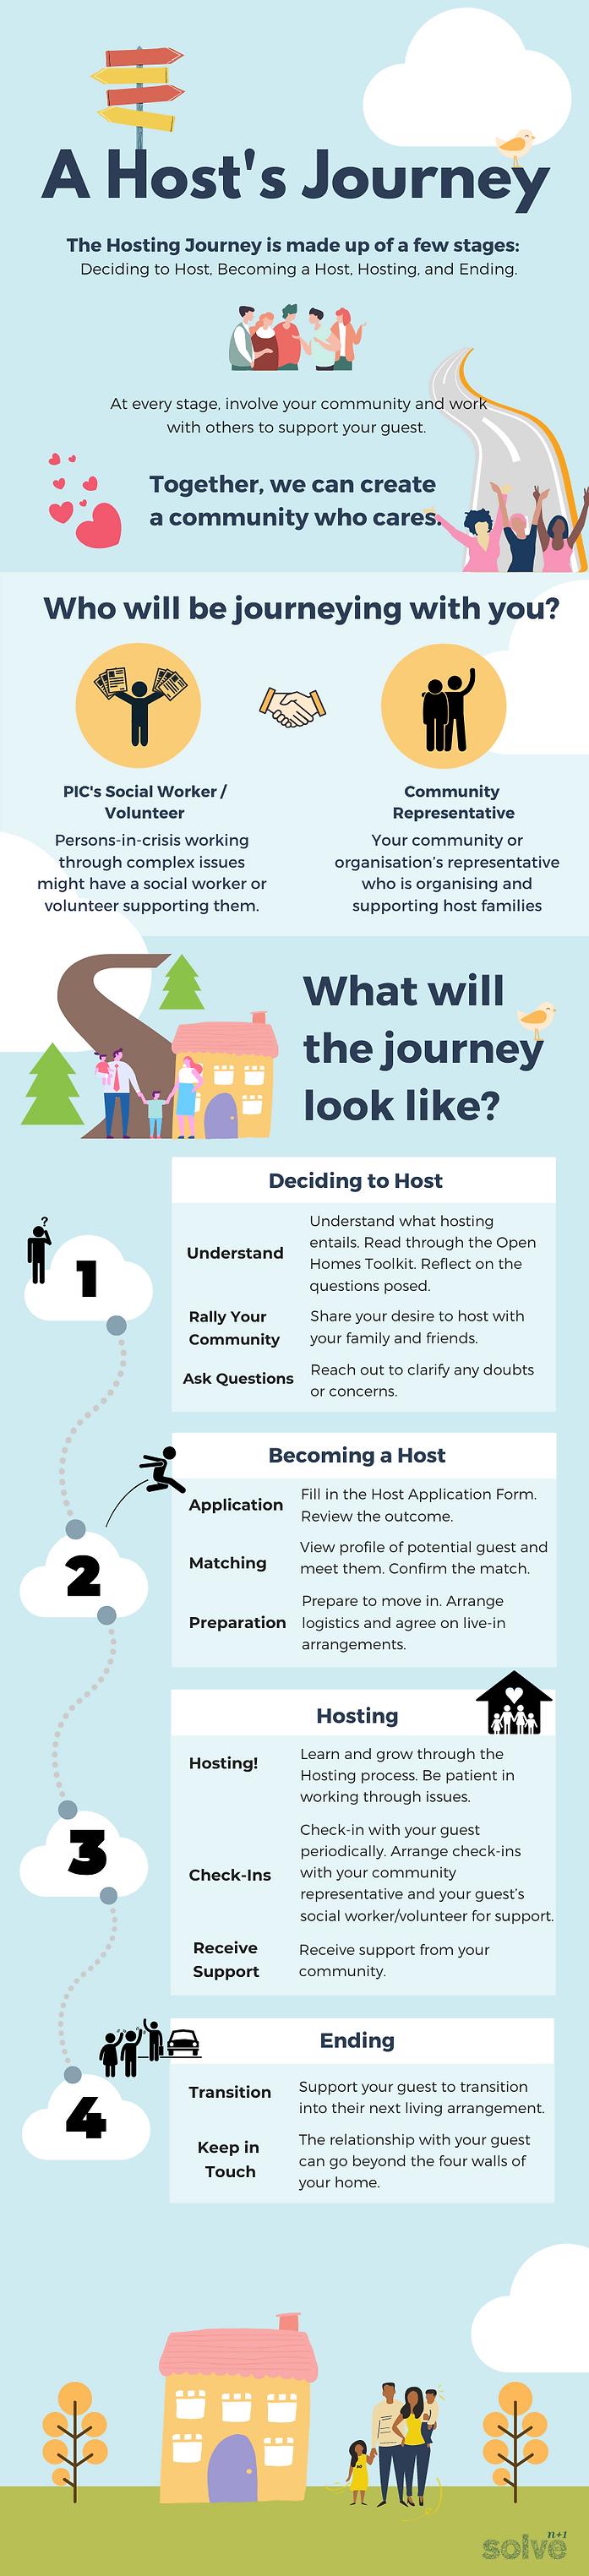 A Host's Journey v2.png